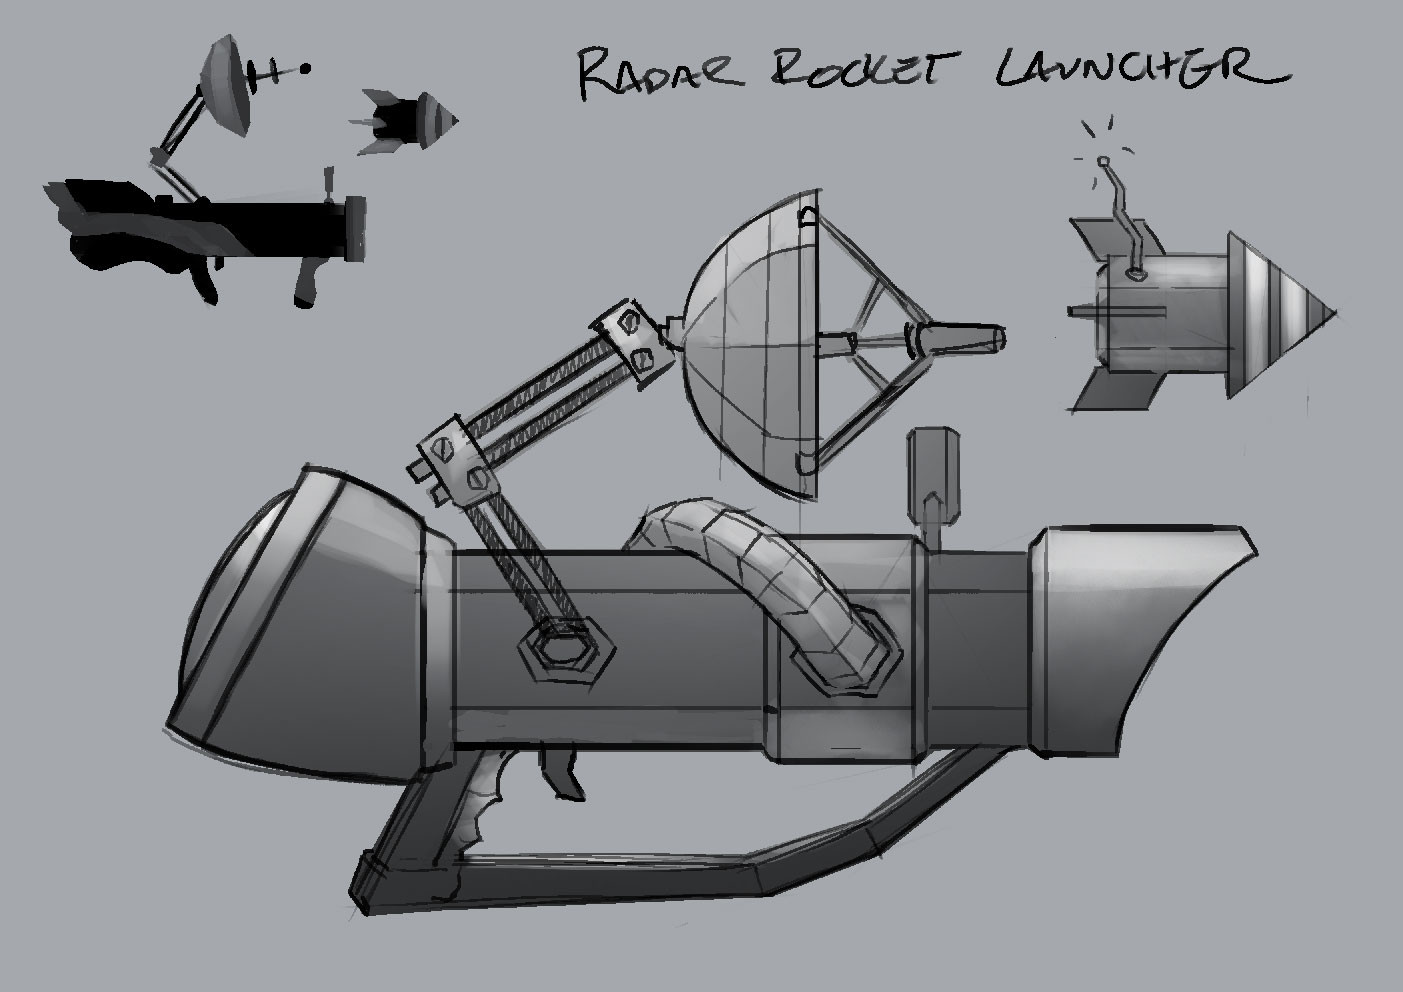 Radar Rocket Launcher - Weapon/Prop Concept